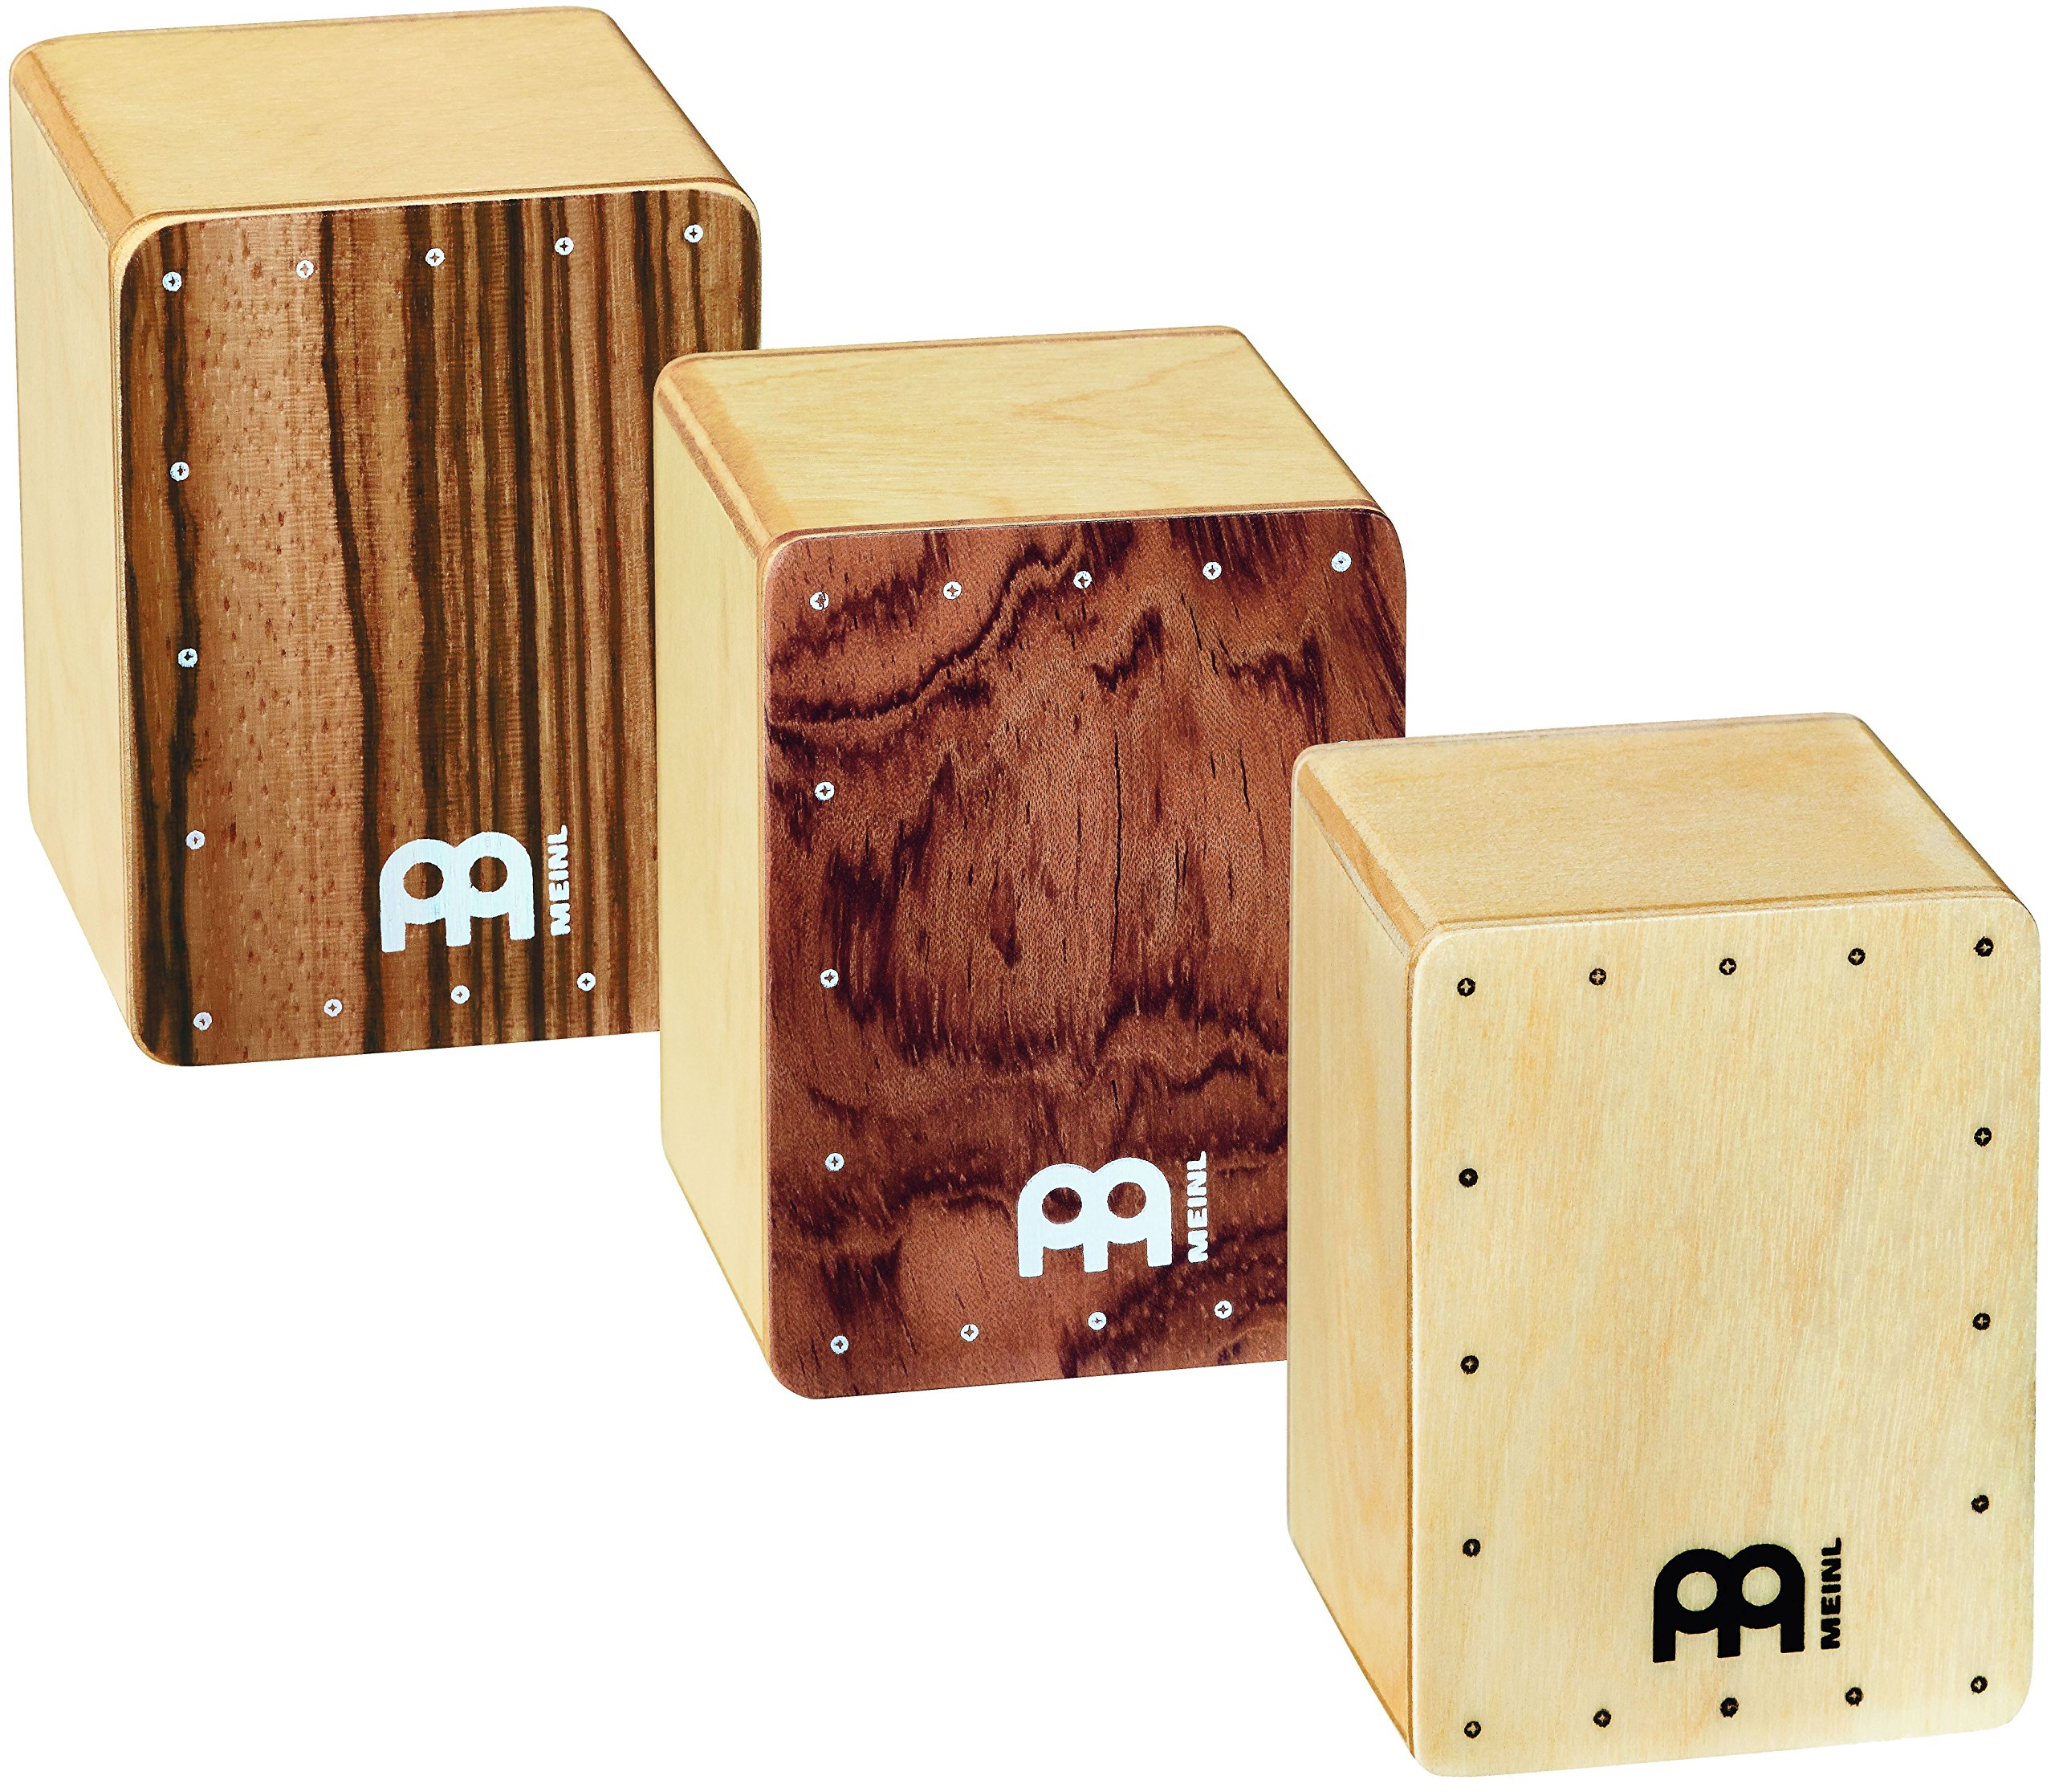 Meinl Percussion Mini Cajon Shaker 3-Piece Set Made in Europe-Baltic Birch Body, 2-Year Warranty (SH50-SET)